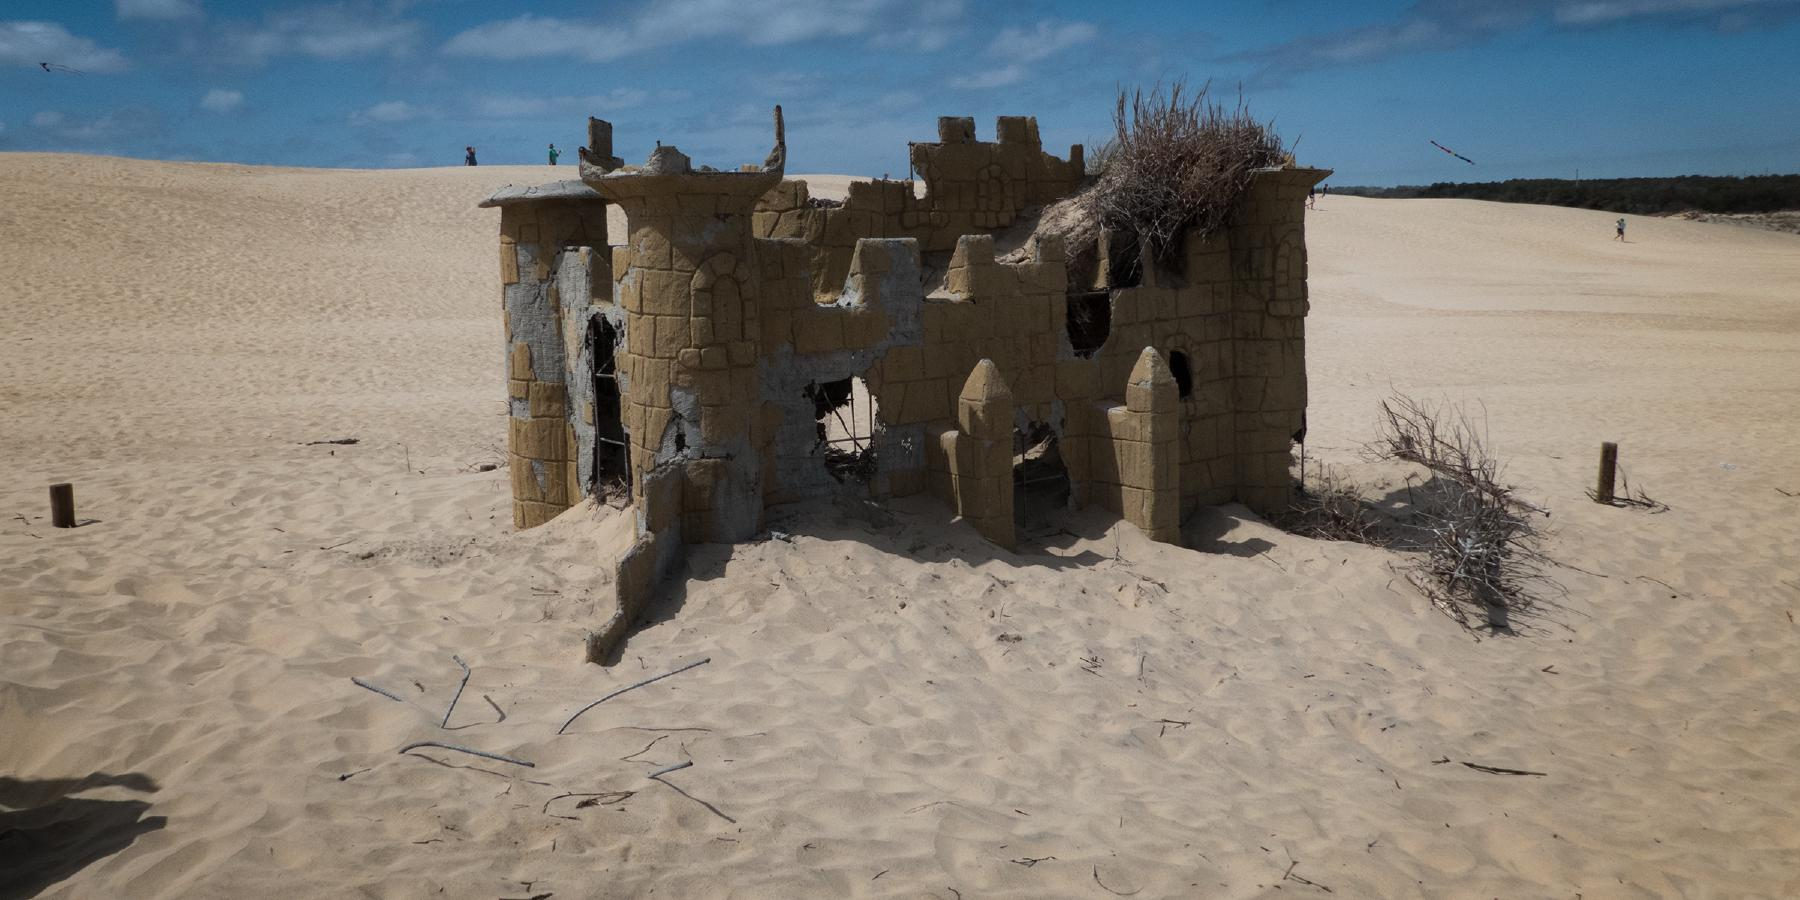 The ruins of a miniature golf castle peak out of the dunes of Jockeys Ridge in Nags Head, North Carolina.